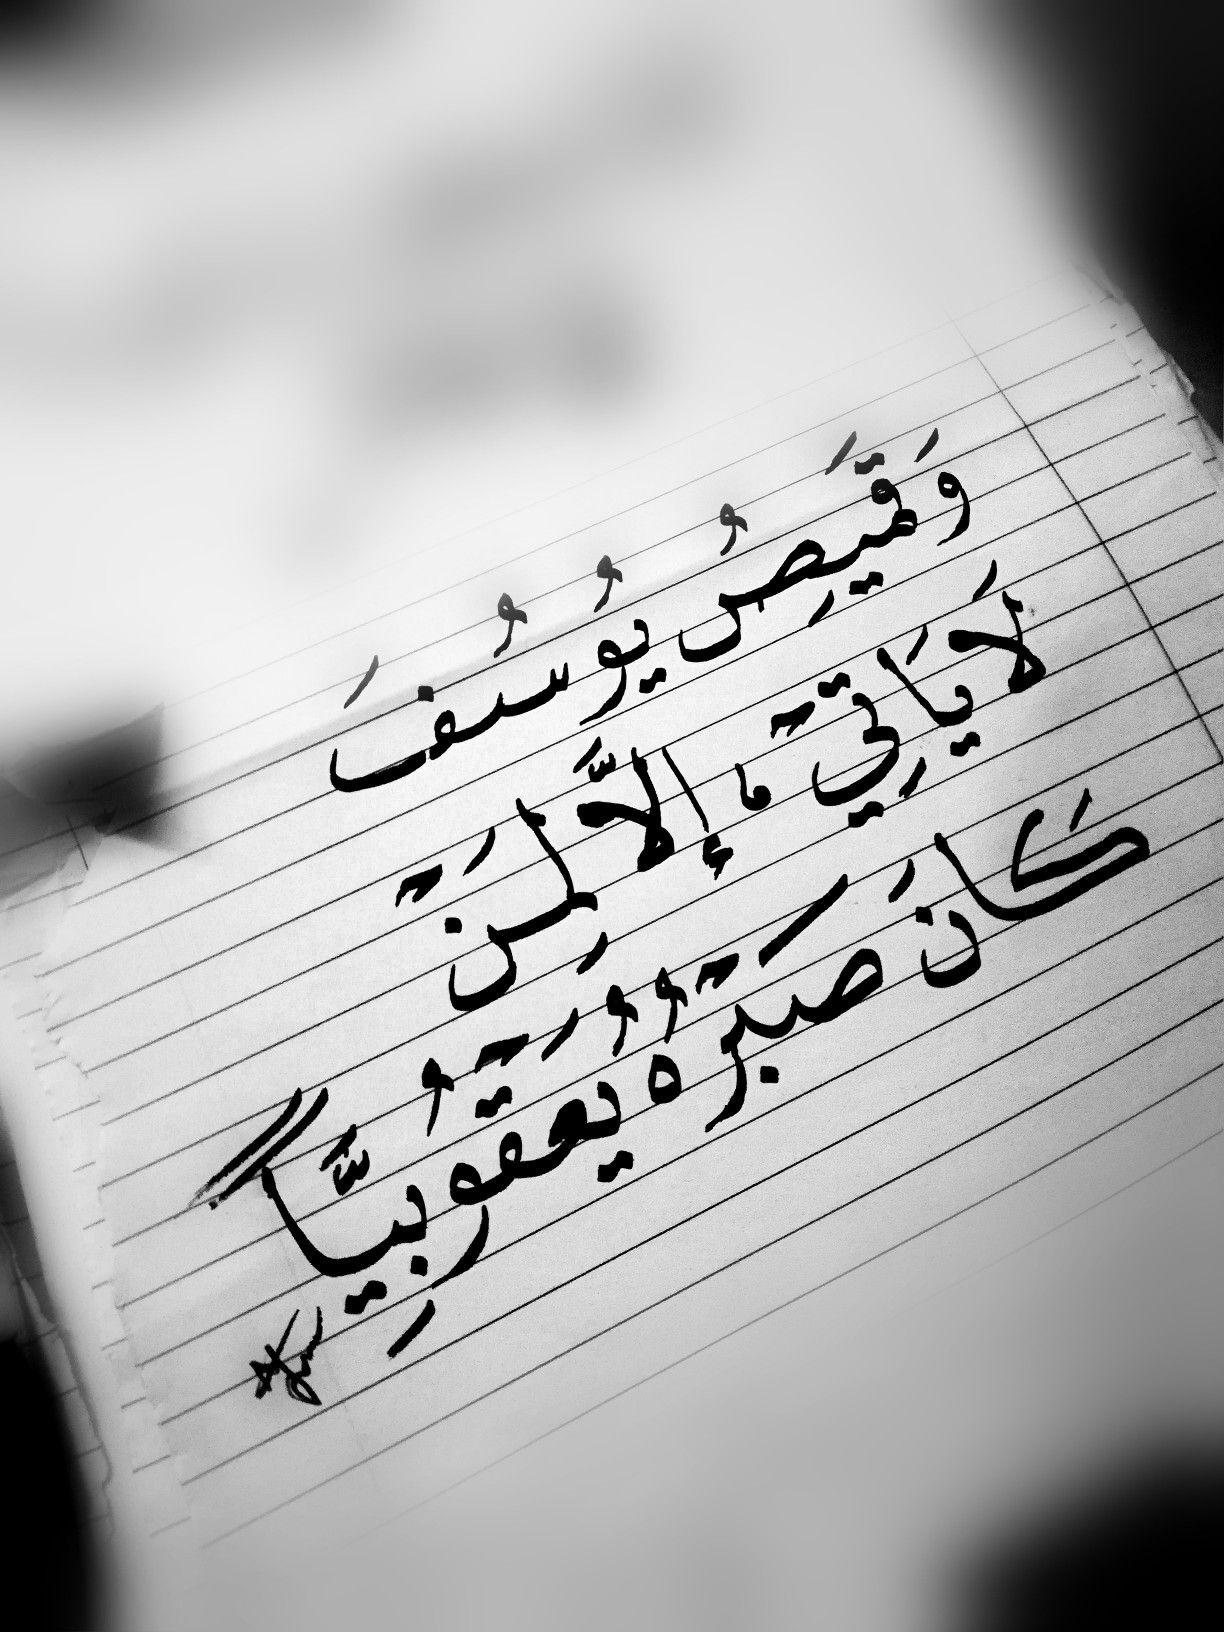 وقميص يوسف لا ياتي الا لمن كان صبره يعقوبيا Mood Quotes Sayings Arabic Calligraphy